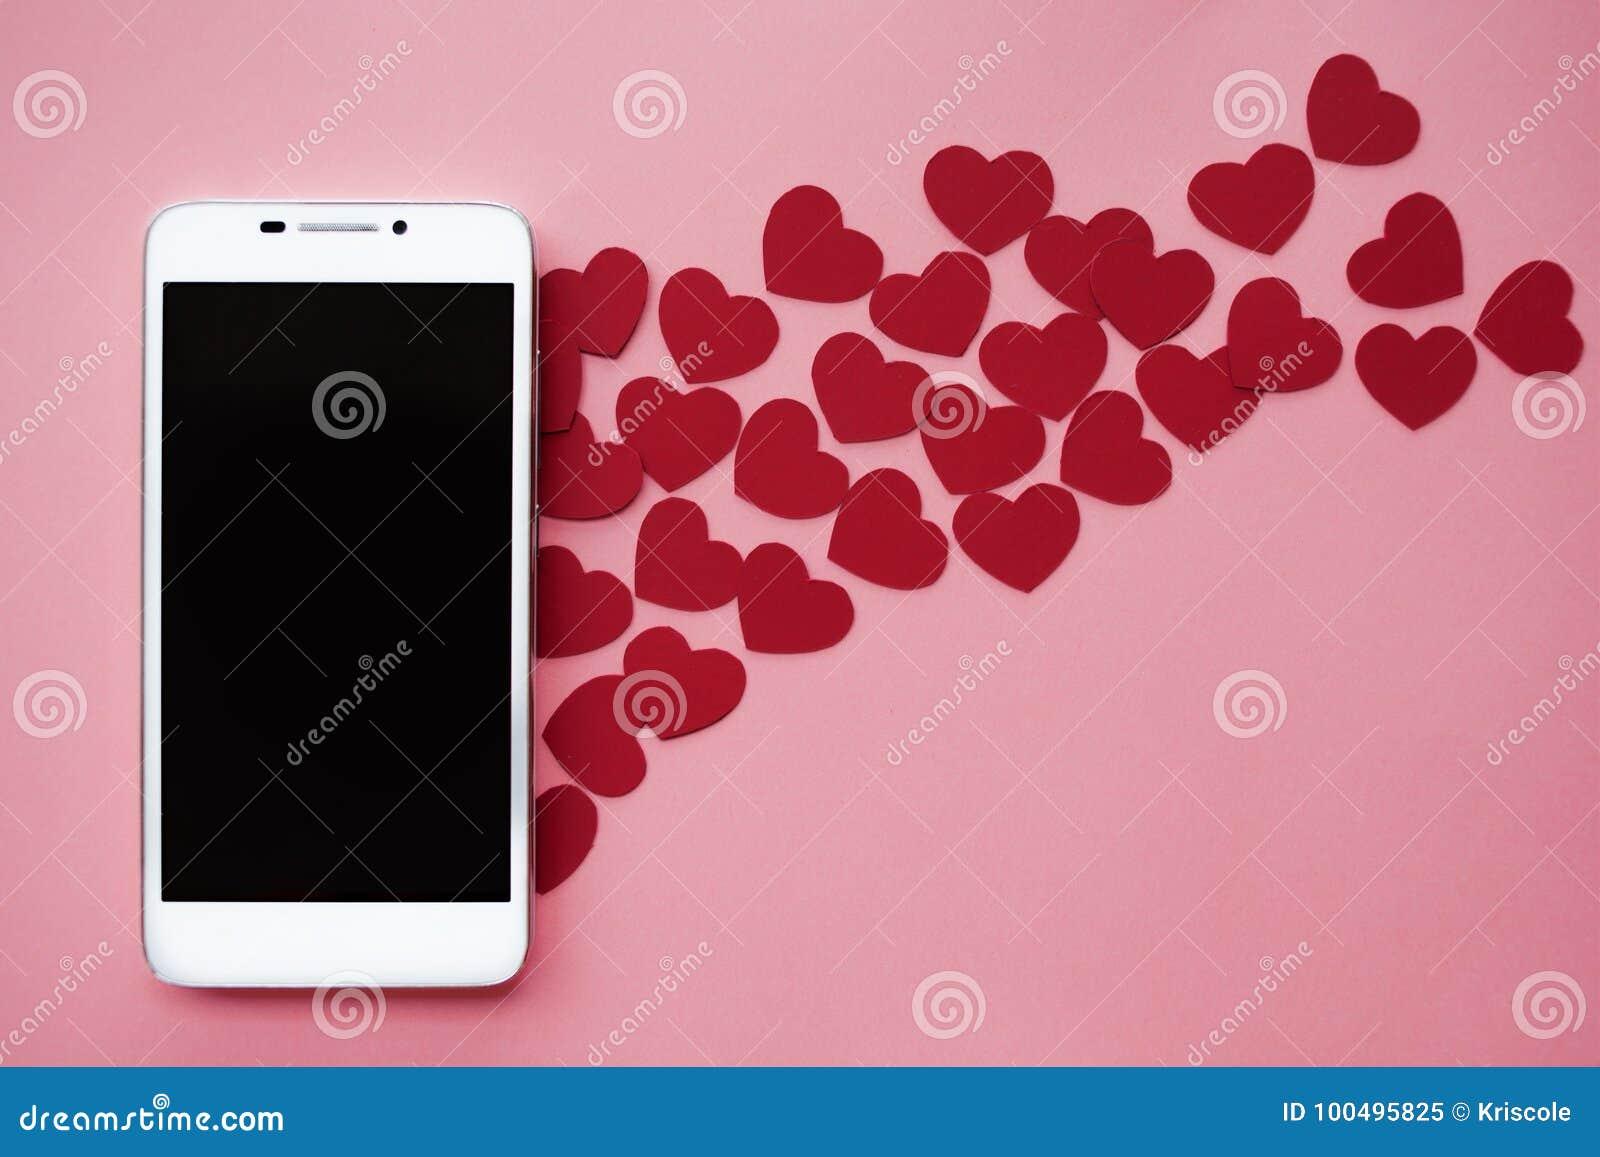 Dating app pink